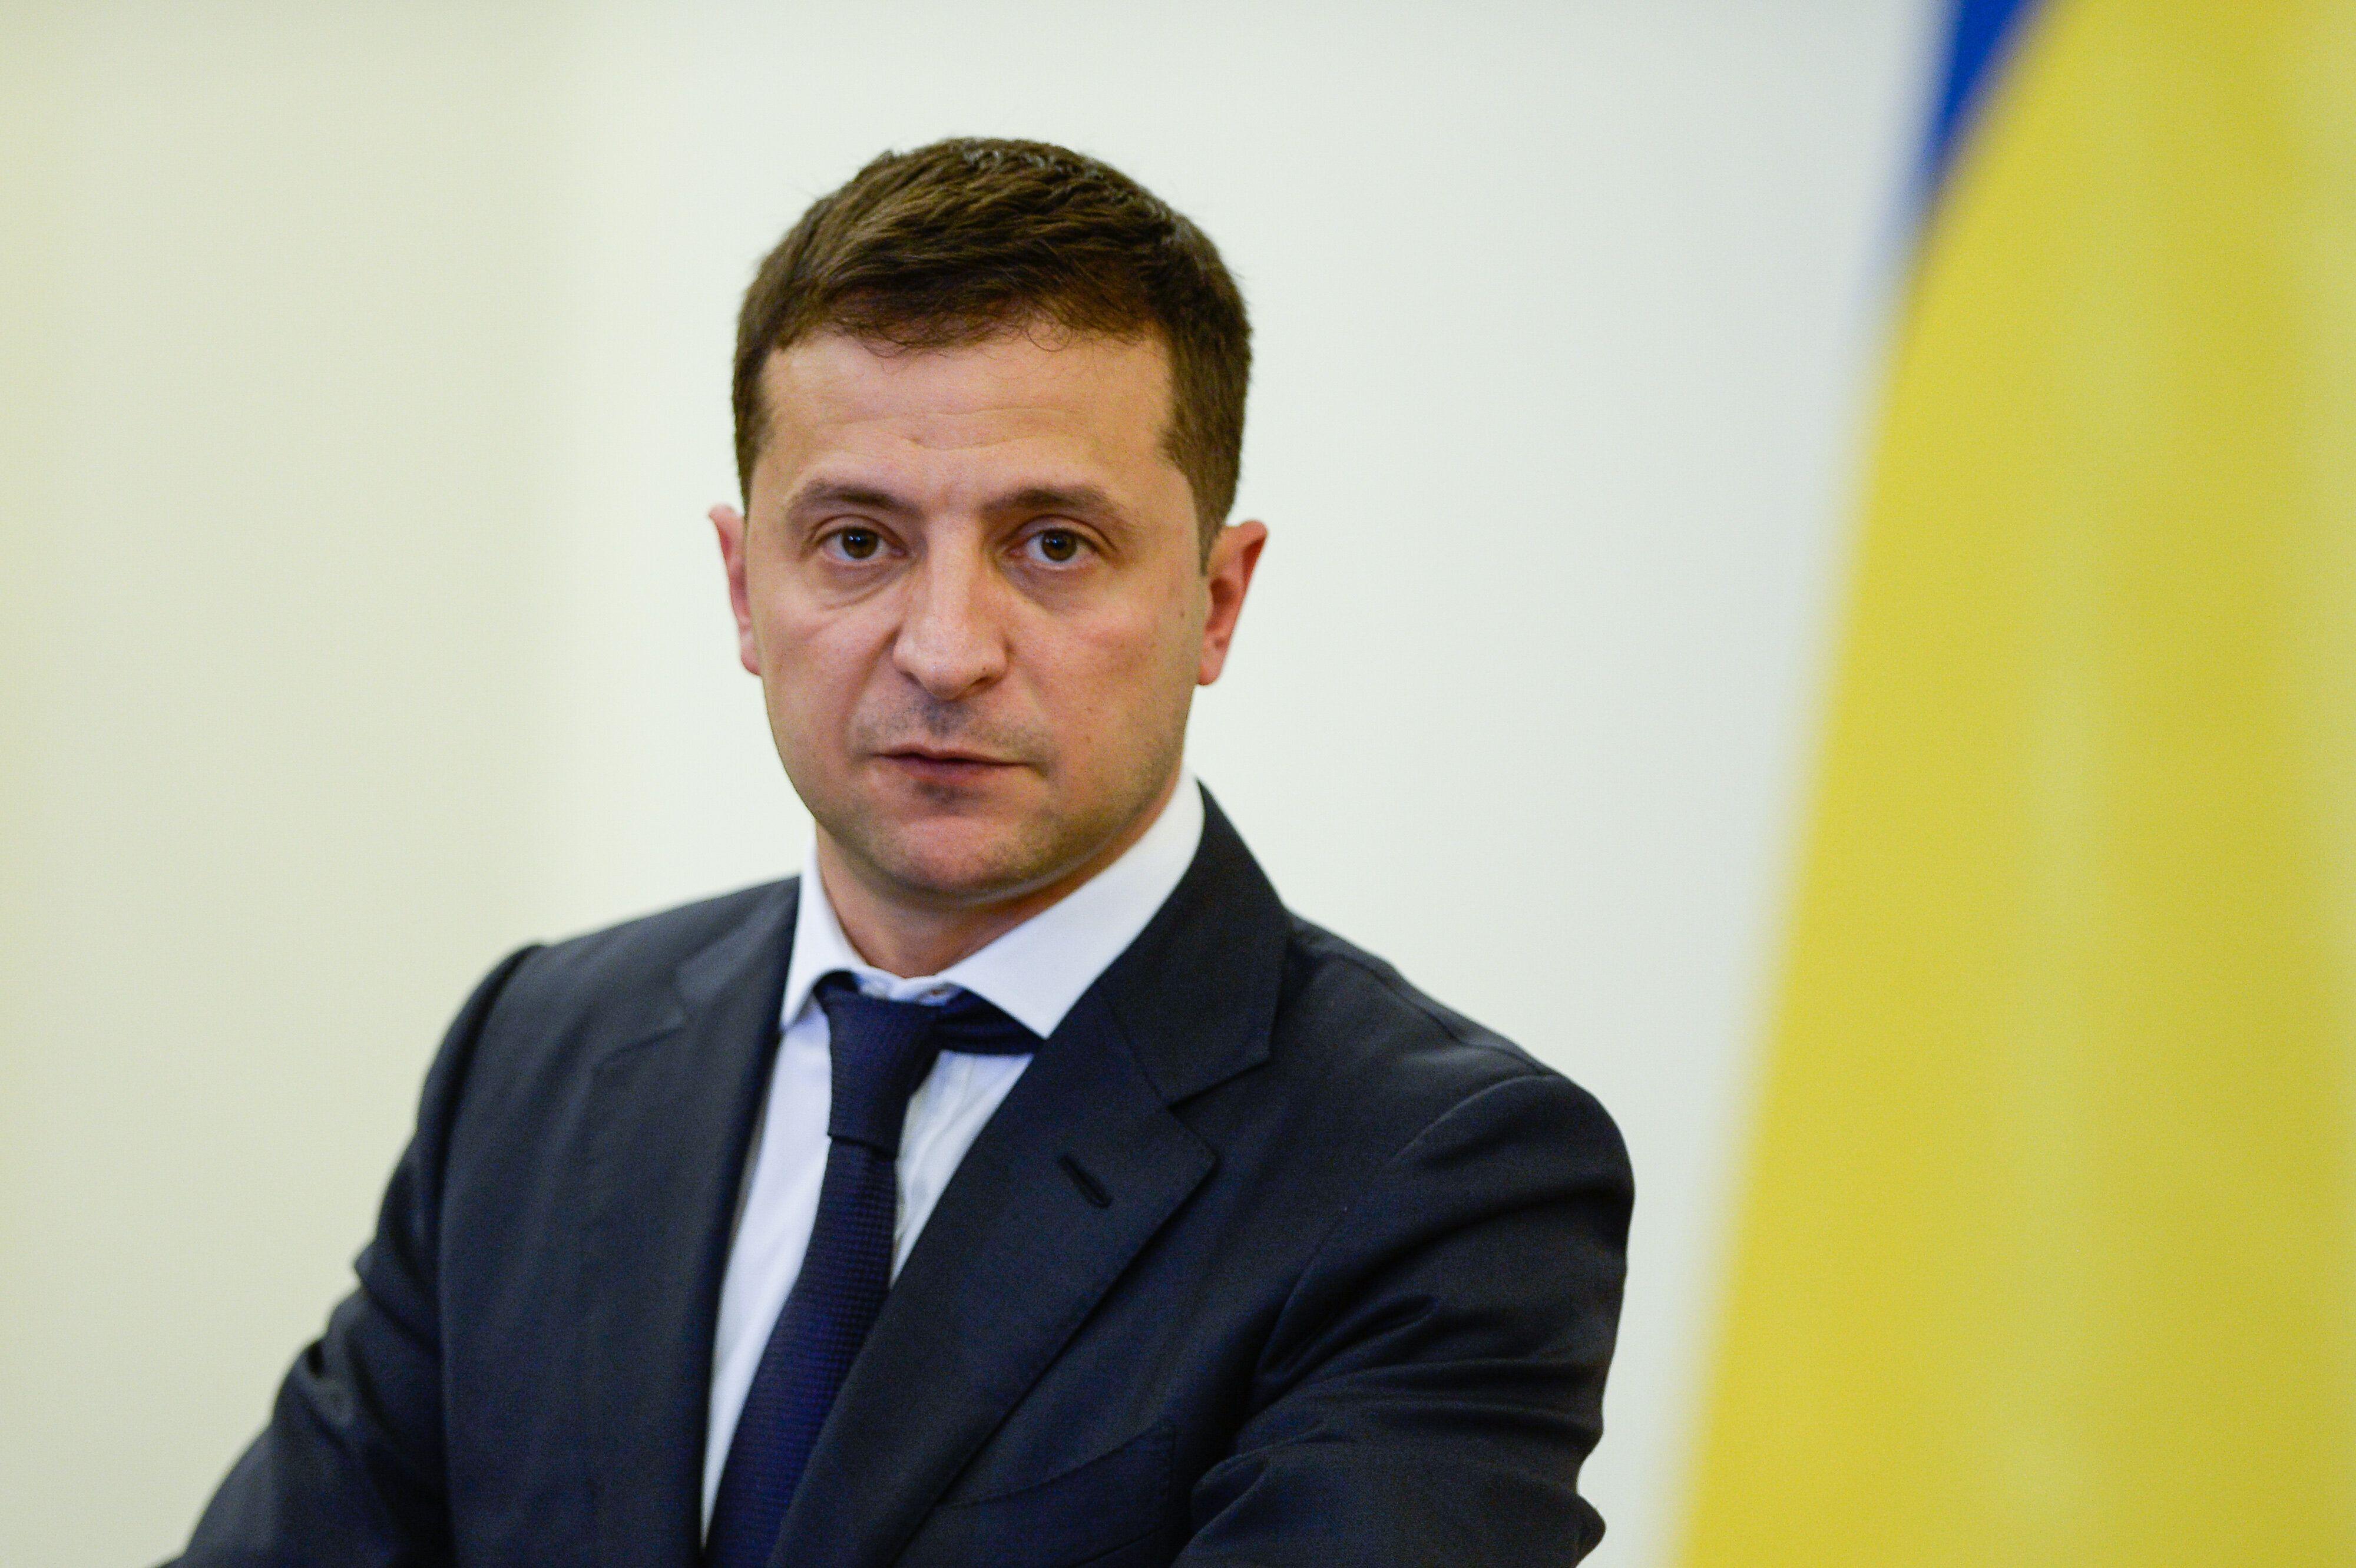 U.S. President Donald Trump has been volunteering details of his July phone call with Ukrainian President Volodymyr Zelensky,